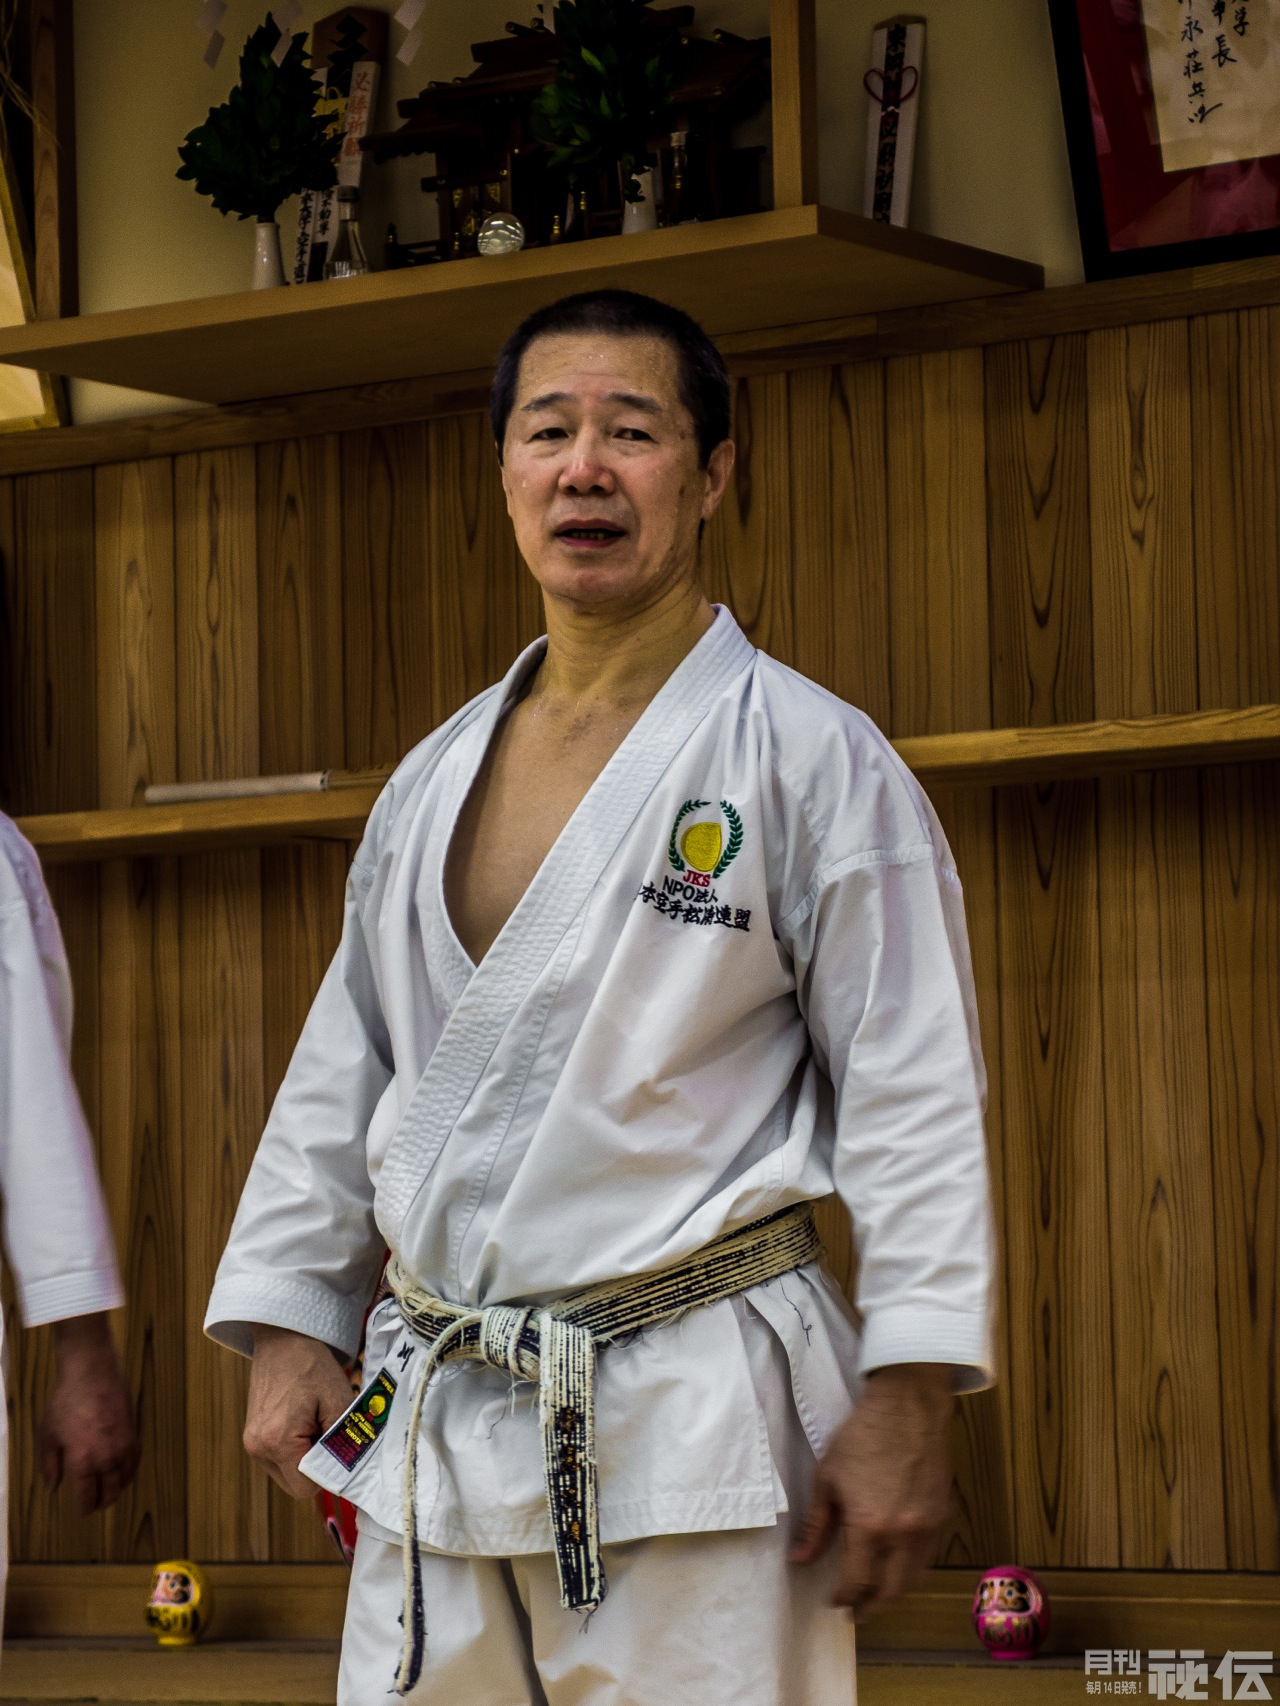 An afternoon of Shotokan: Japan Karate Shoto Federation's